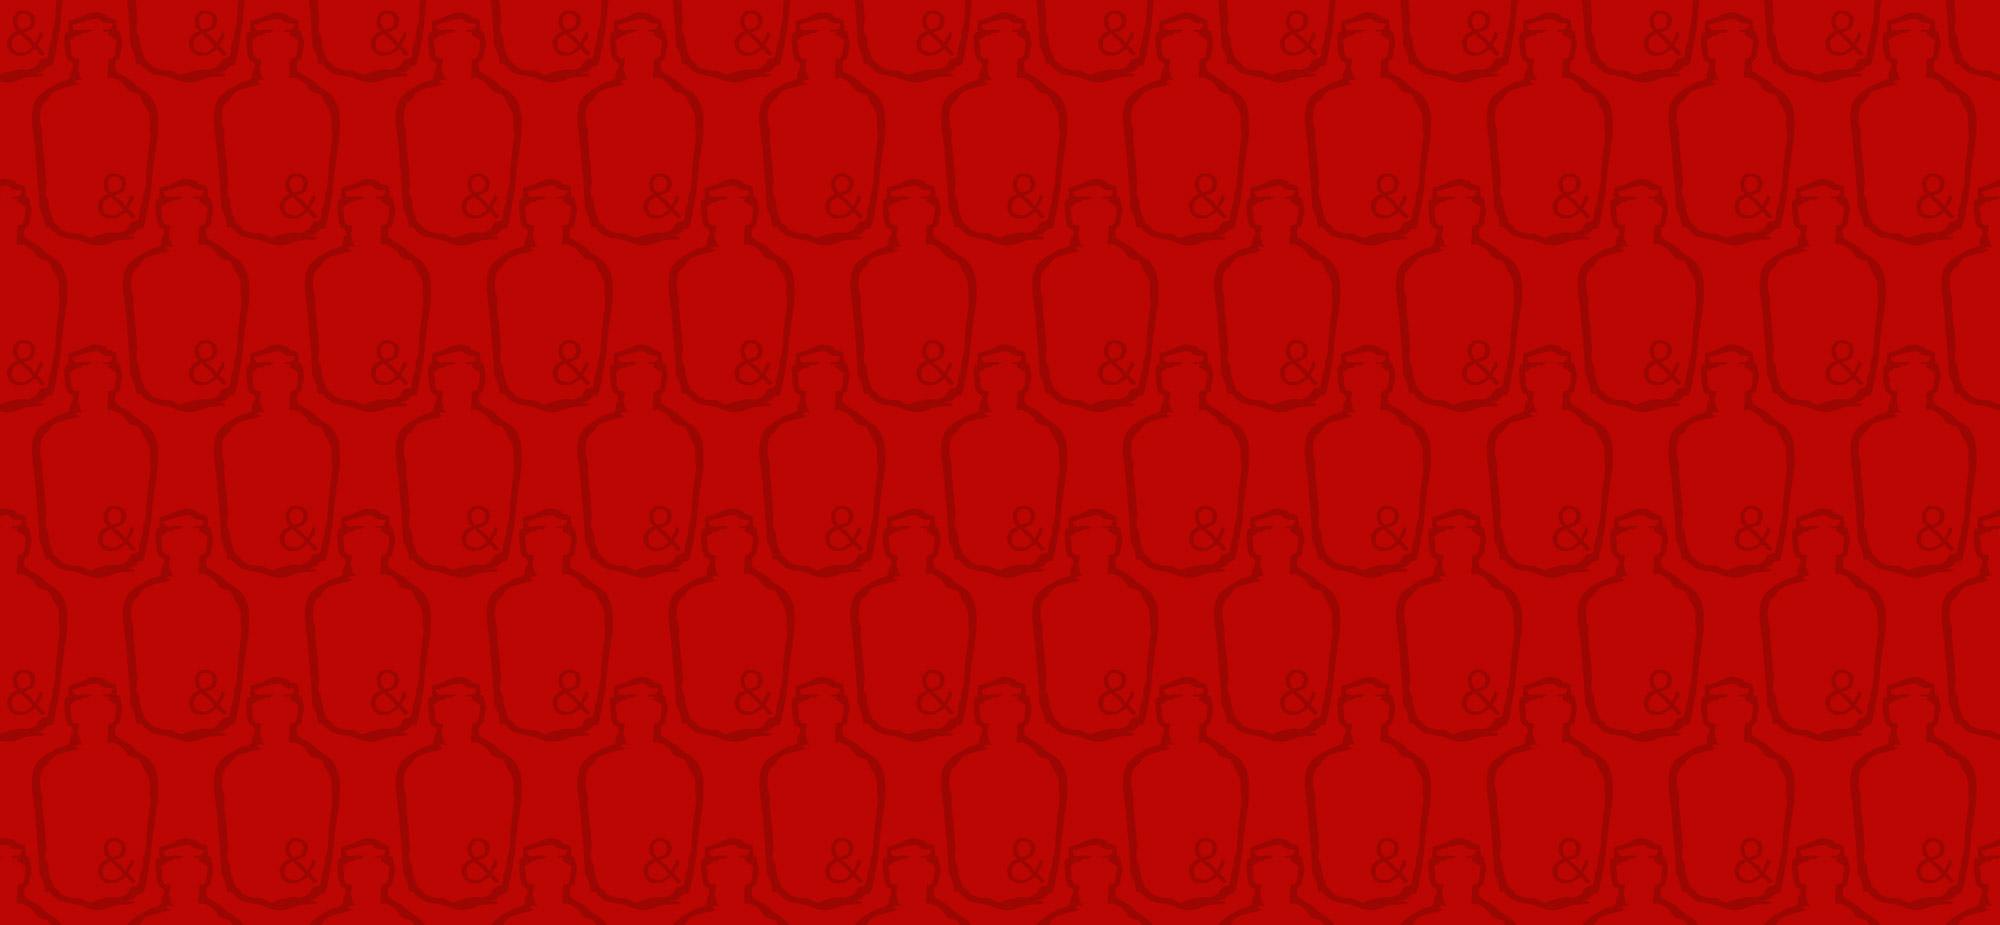 Colm O Connor, Colm O'Connor, Colm O Connor graphic design, Colm O'Connor graphic design, Colm O Connor graphic designer, Colm O'Connor graphic designer, Colm O' Connor Wexford, Colm O Connor Wexford, colmoconnor, Colm O Connor Freelance graphic designer living in Wexford Ireland, Colm O'Connor Freelance graphic designer living in Wexford Ireland, Colm O Connor Graphic Design and Branding Studio Based in Wexford Ireland, Colm O'Connor Graphic Design and Branding Studio Based in Wexford Ireland, Colm O Connor graphic design wexford, Colm O'Connor graphic design wexford, Colm O'Connor graphic design Ireland, Colm O Connor graphic design Ireland, Colm O Connor Studio, Colm O'Connor Studio, Colm O Connor design studio, Colm O'Connor design studio, Colm O Connor design studio wexford, Colm O'Connor design studio Wexford, Colm O Connor design studio Ireland, Colm O'Connor design studio Ireland, Colm O Connor graphic design studio, Colm O'Connor Graphic design studio, Colm O Connor graphic design studio wexford, Colm O'Connor graphic design studio wexford, design studio wexford, design studio ireland, graphic designer, graphic design, freelance graphic design, freelance graphic designer, freelance graphic design wexford, freelance graphic designer wexford, web design, web designer, website design, website designer, graphic design waterford, graphic designer waterford, graphic design cork, graphic designer cork, graphic design dublin, graphic designer dublin, graphic designer Ireland, illustrator, graphic design portfolio, brand identity, print, logo, logotype, logo mark, visual identity, branding, business card, logo design, logo designer, logo designer wexford, logo designer waterford, logo designer cork, logo designer dublin, brand designer, brand designer wexford, brand designer dublin, brand designer waterford, brand designer cork, typography, graphic design and branding studio based in wexford, graphic design studio based in wexford, design agency, best graphic design